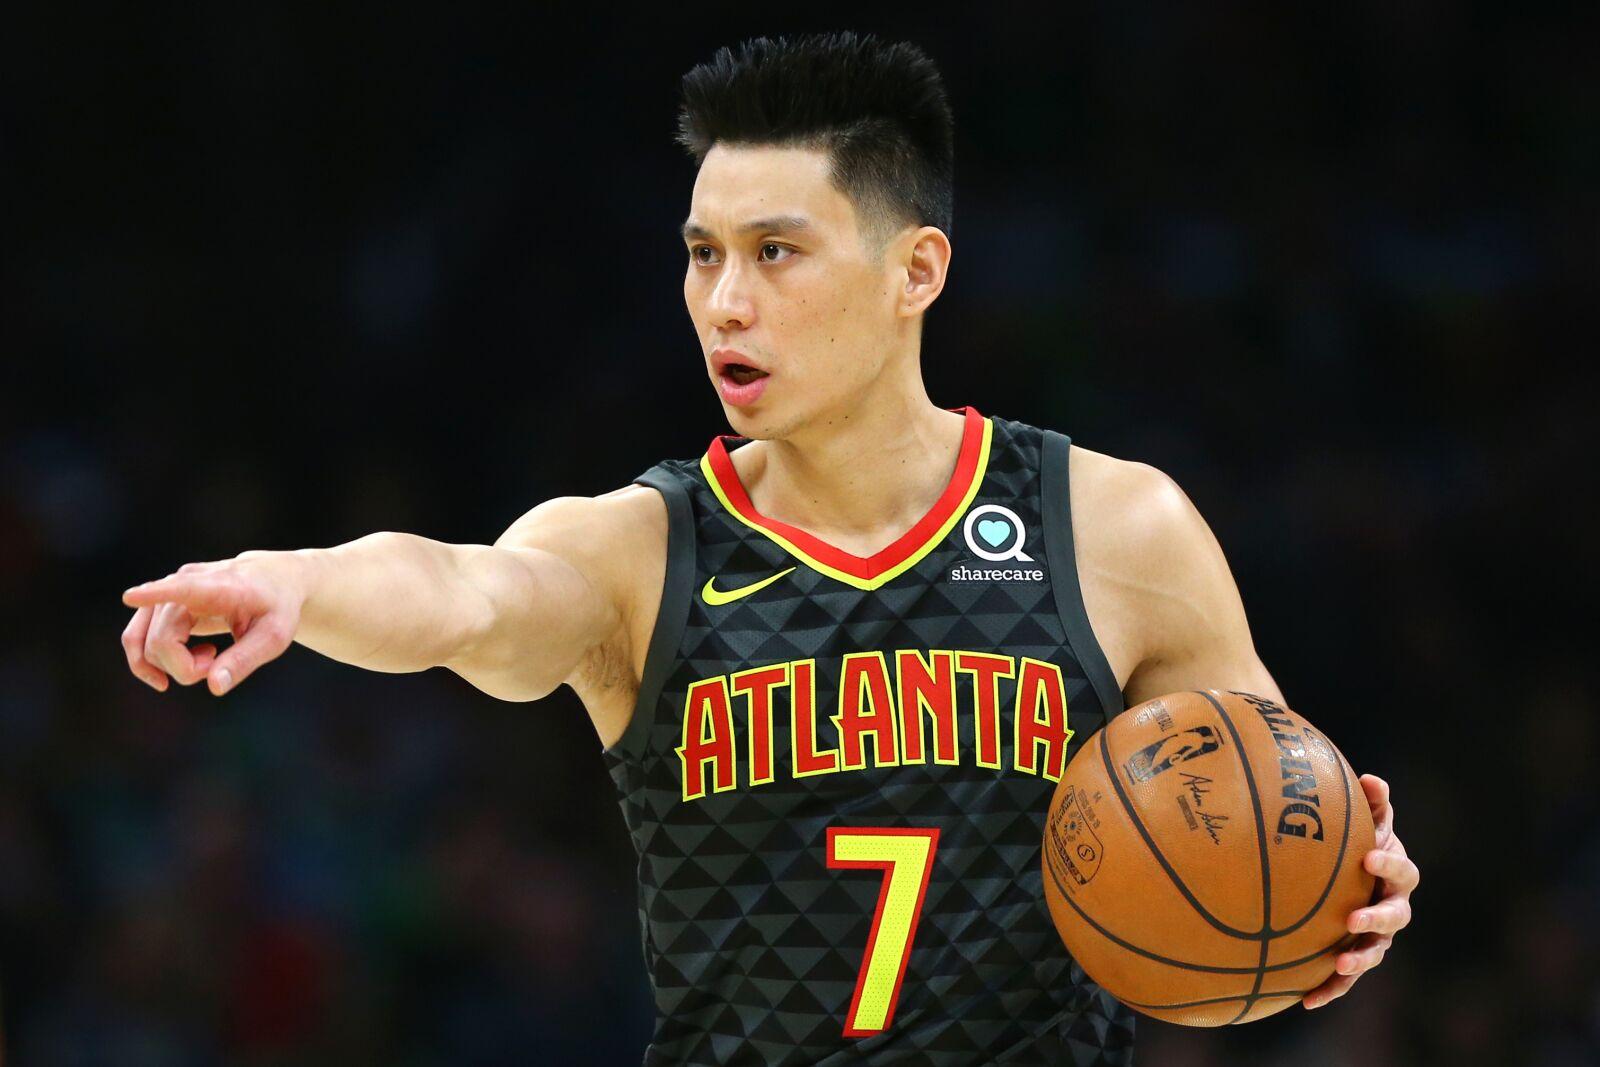 de77ac88a8f Toronto Raptors: Jeremy Lin brings much needed experience, depth